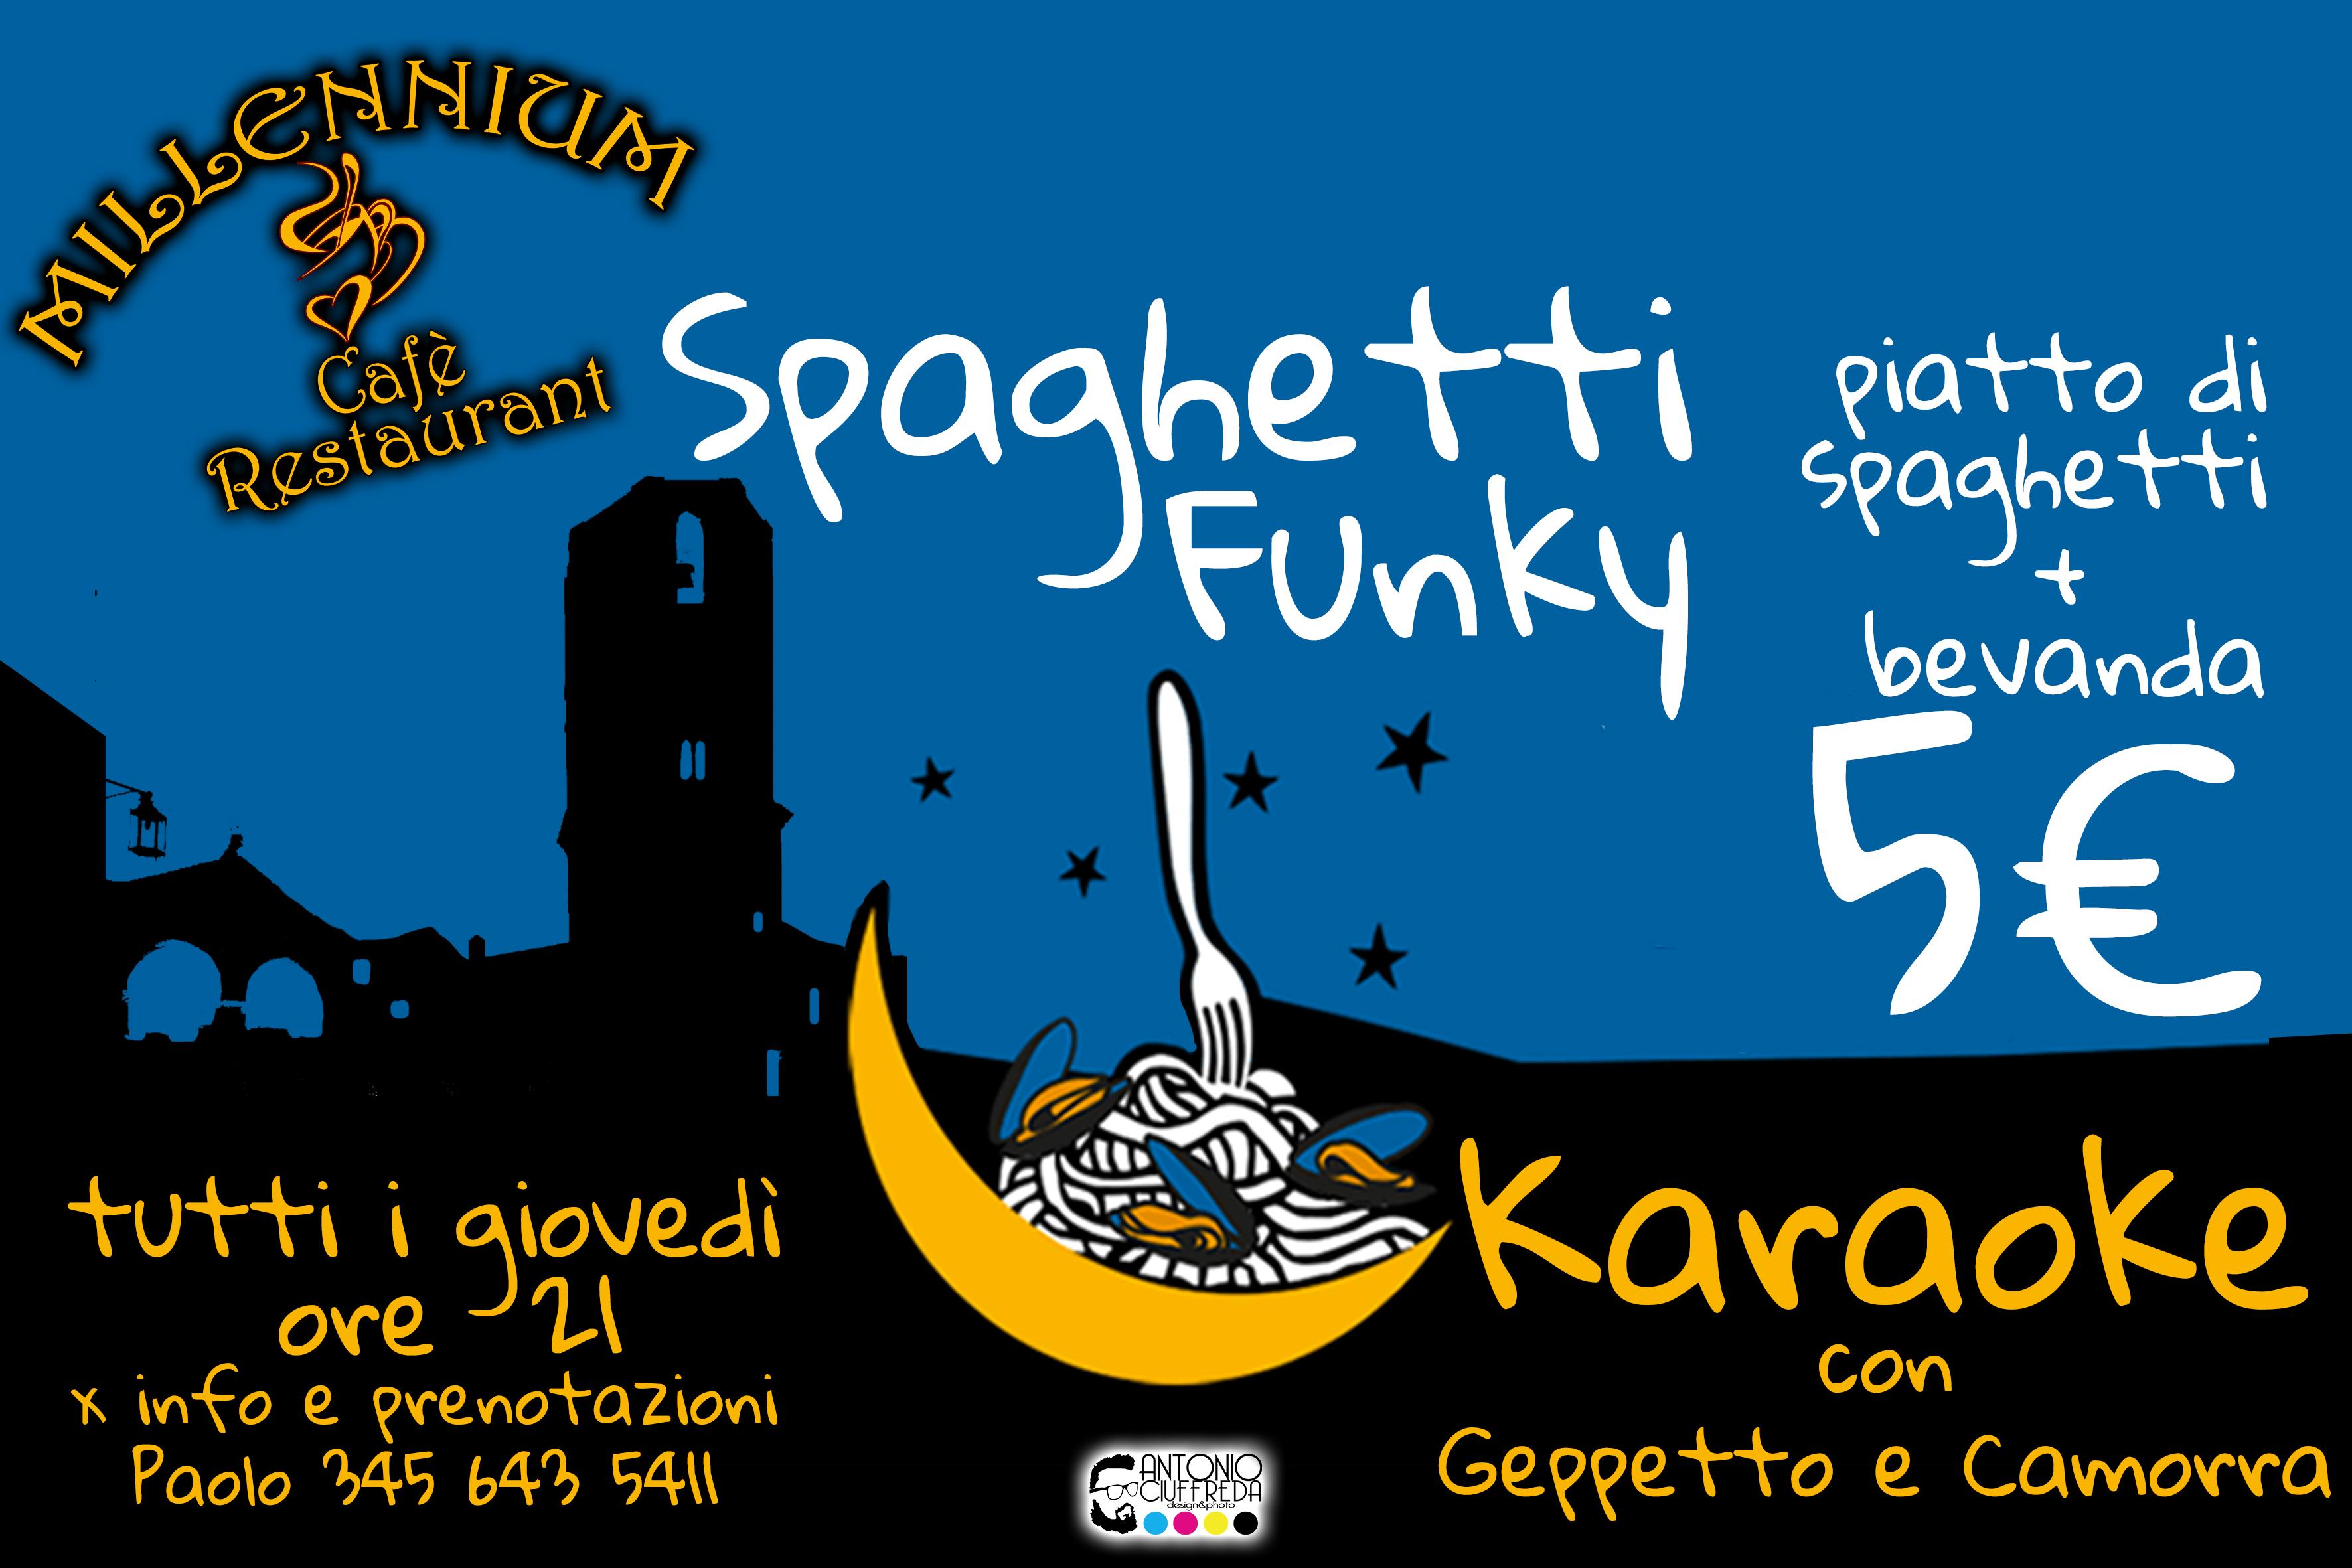 spaghetti funky